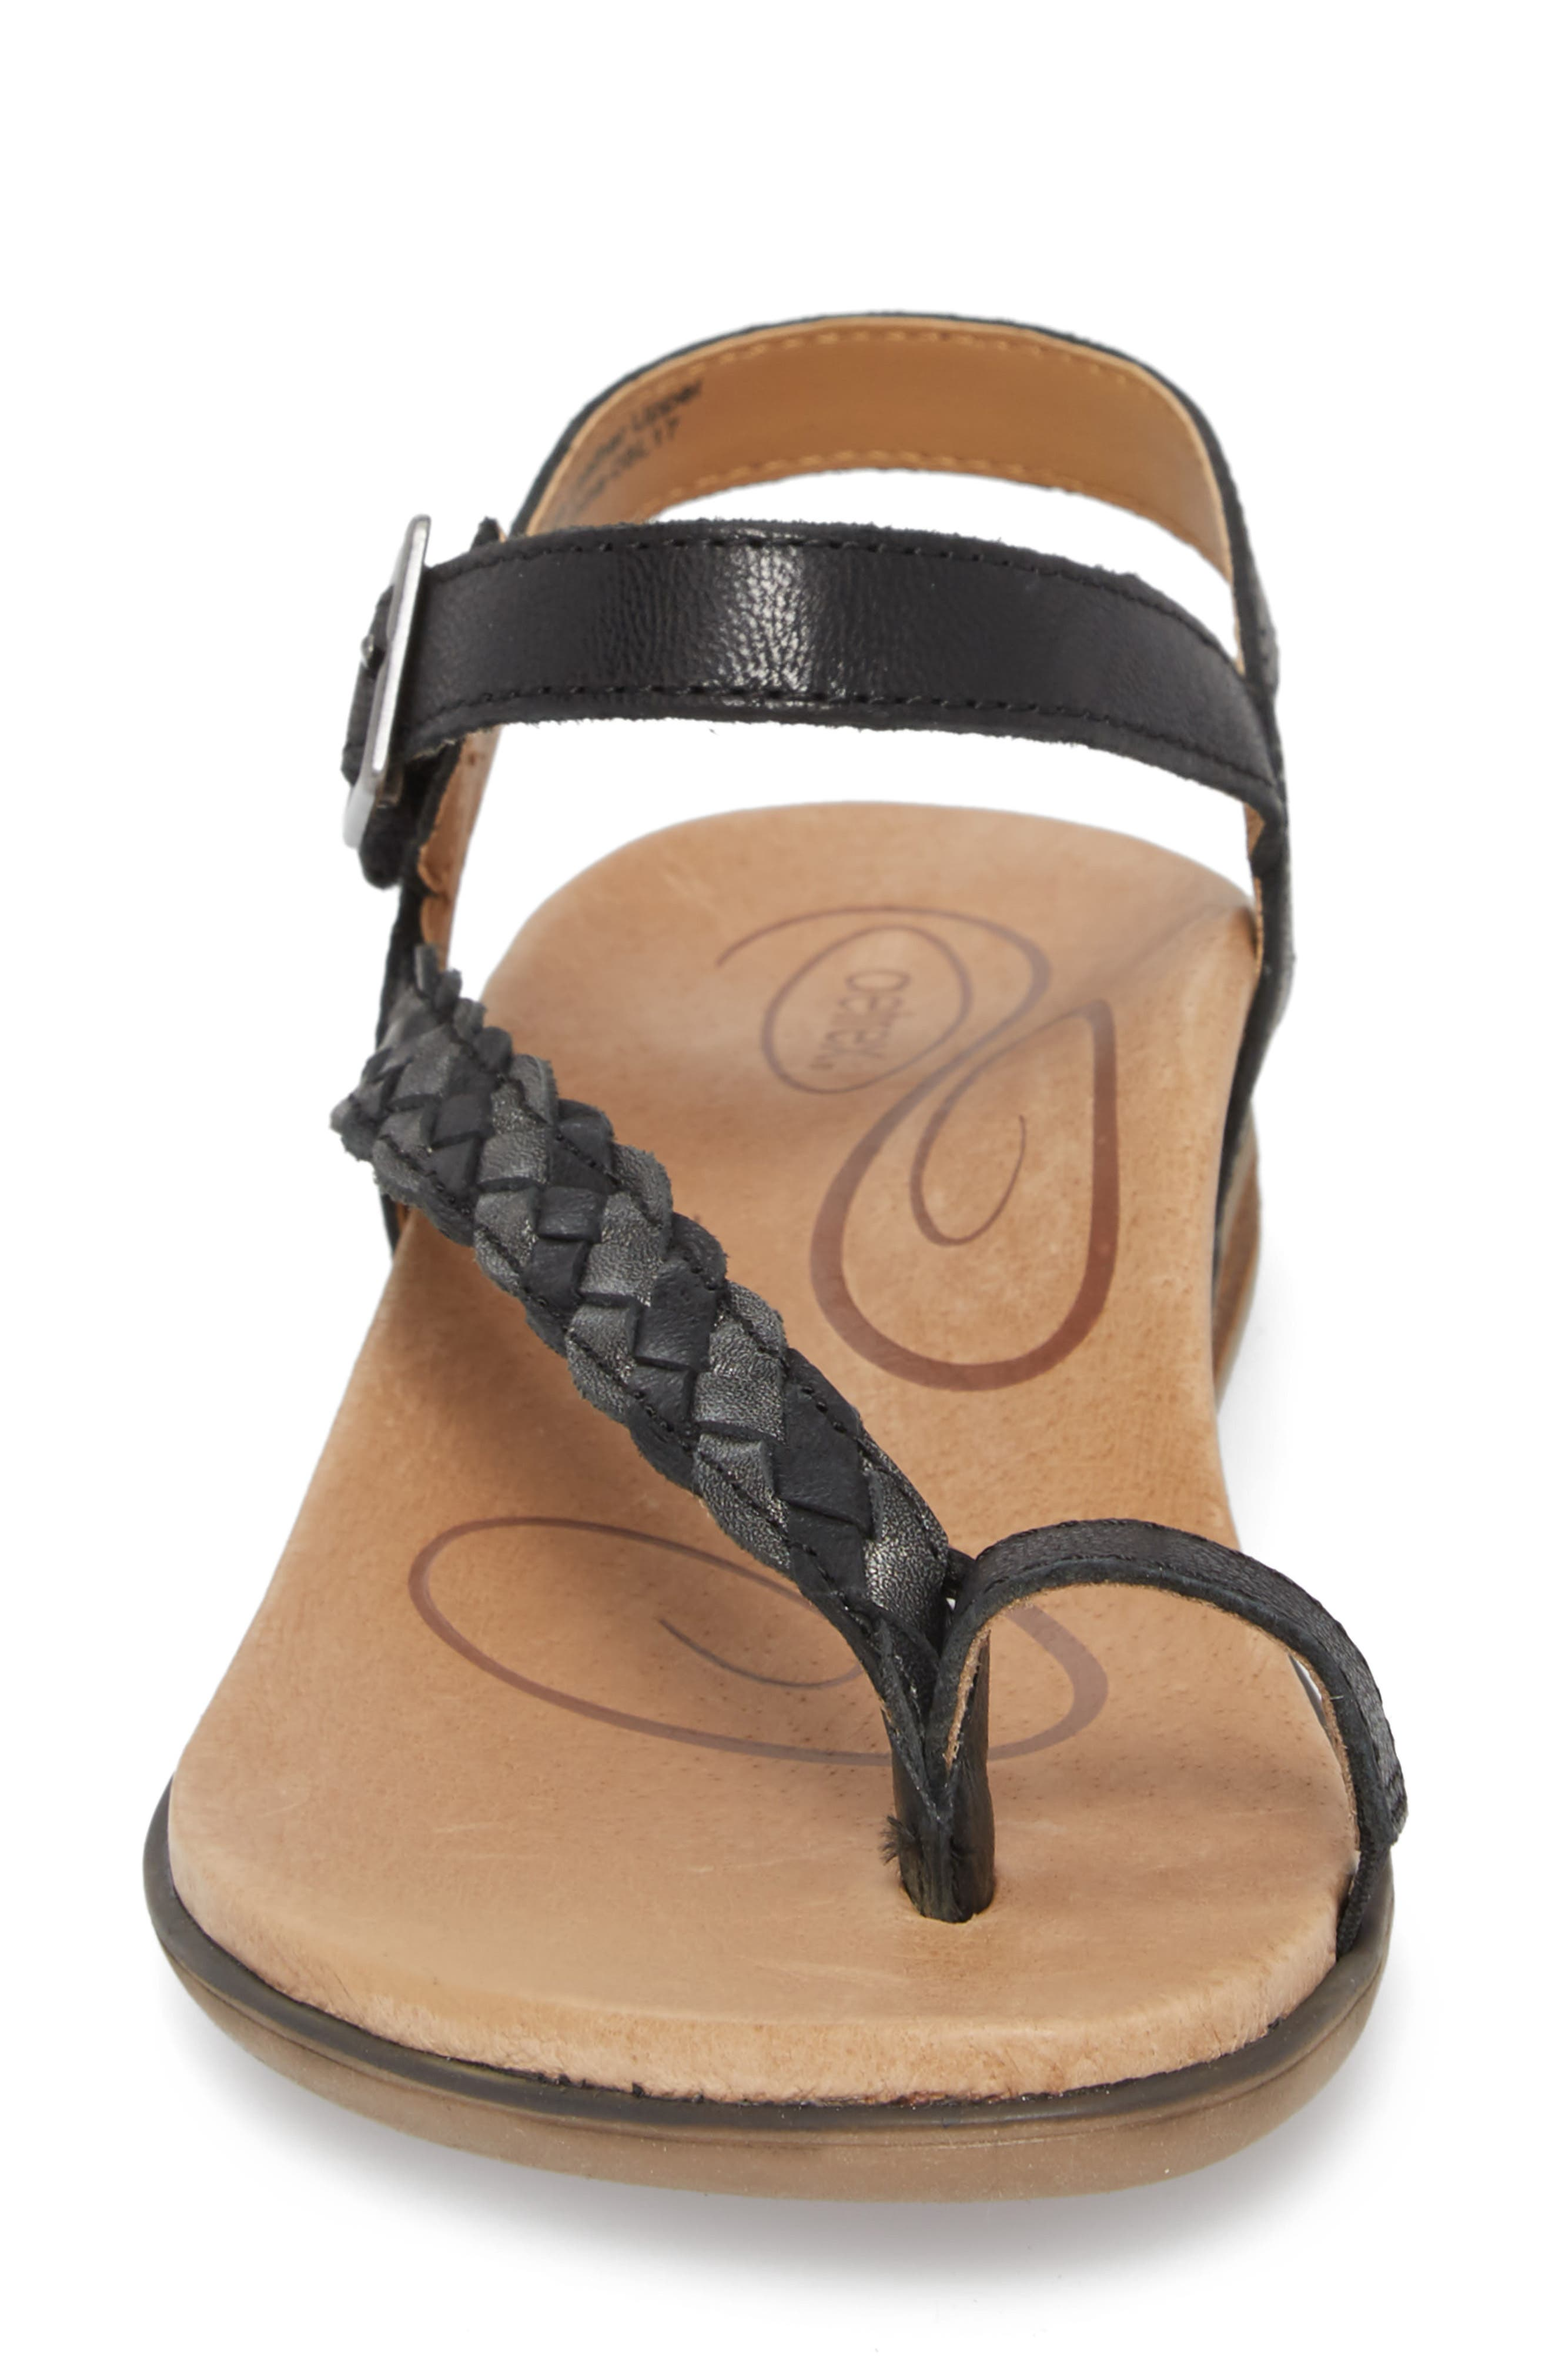 AETREX, Evie Braided Strap Sandal, Alternate thumbnail 4, color, BLACK LEATHER